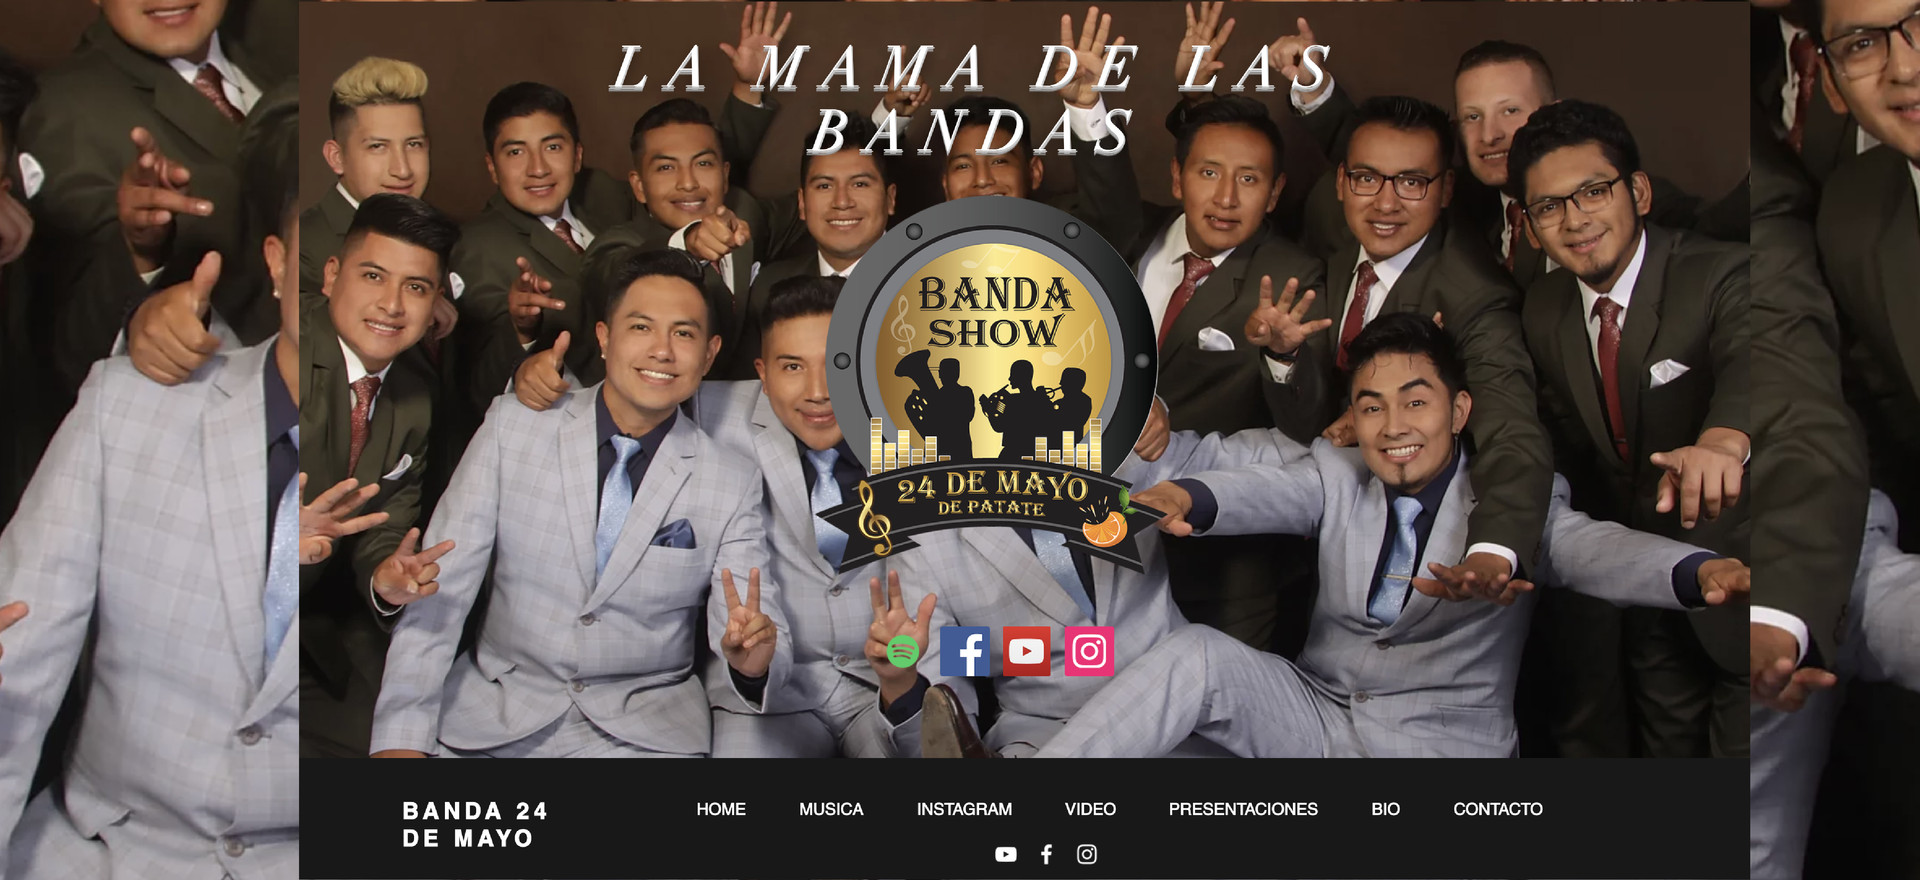 BANDA 24 DE MAYO